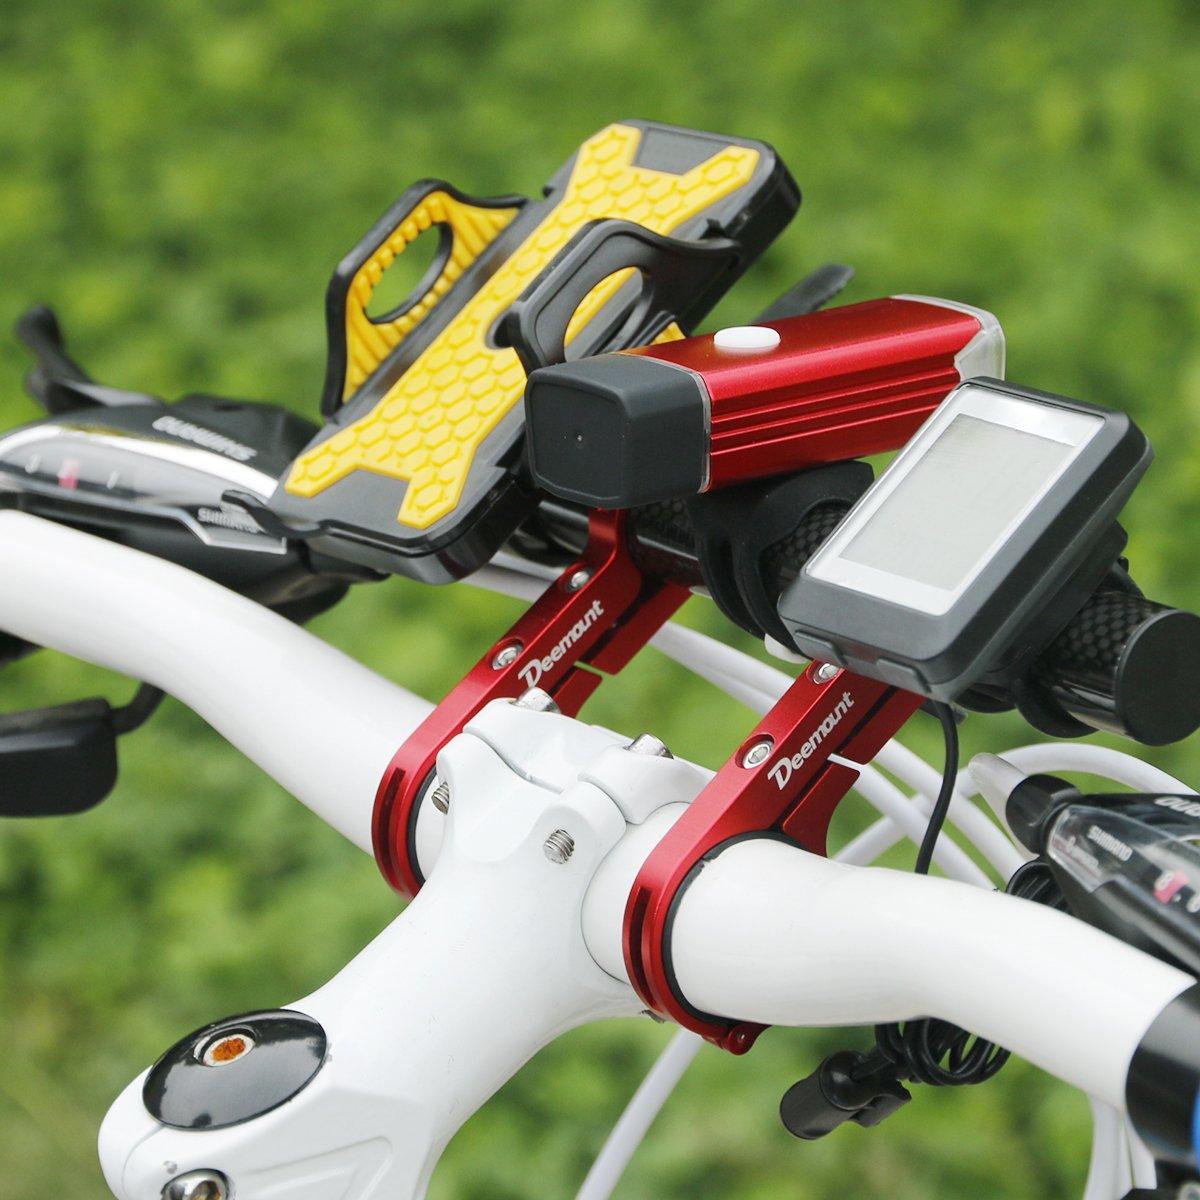 DEEMOUNT Bike Handlebar Extension Rack 202mm Bicycle Double Clamp Bracket Carbon Fiber Extender Accessories Flashlight Lamp Phone Mount Bracket Stand Holder Space Saver - Red by DEEMOUNT (Image #8)